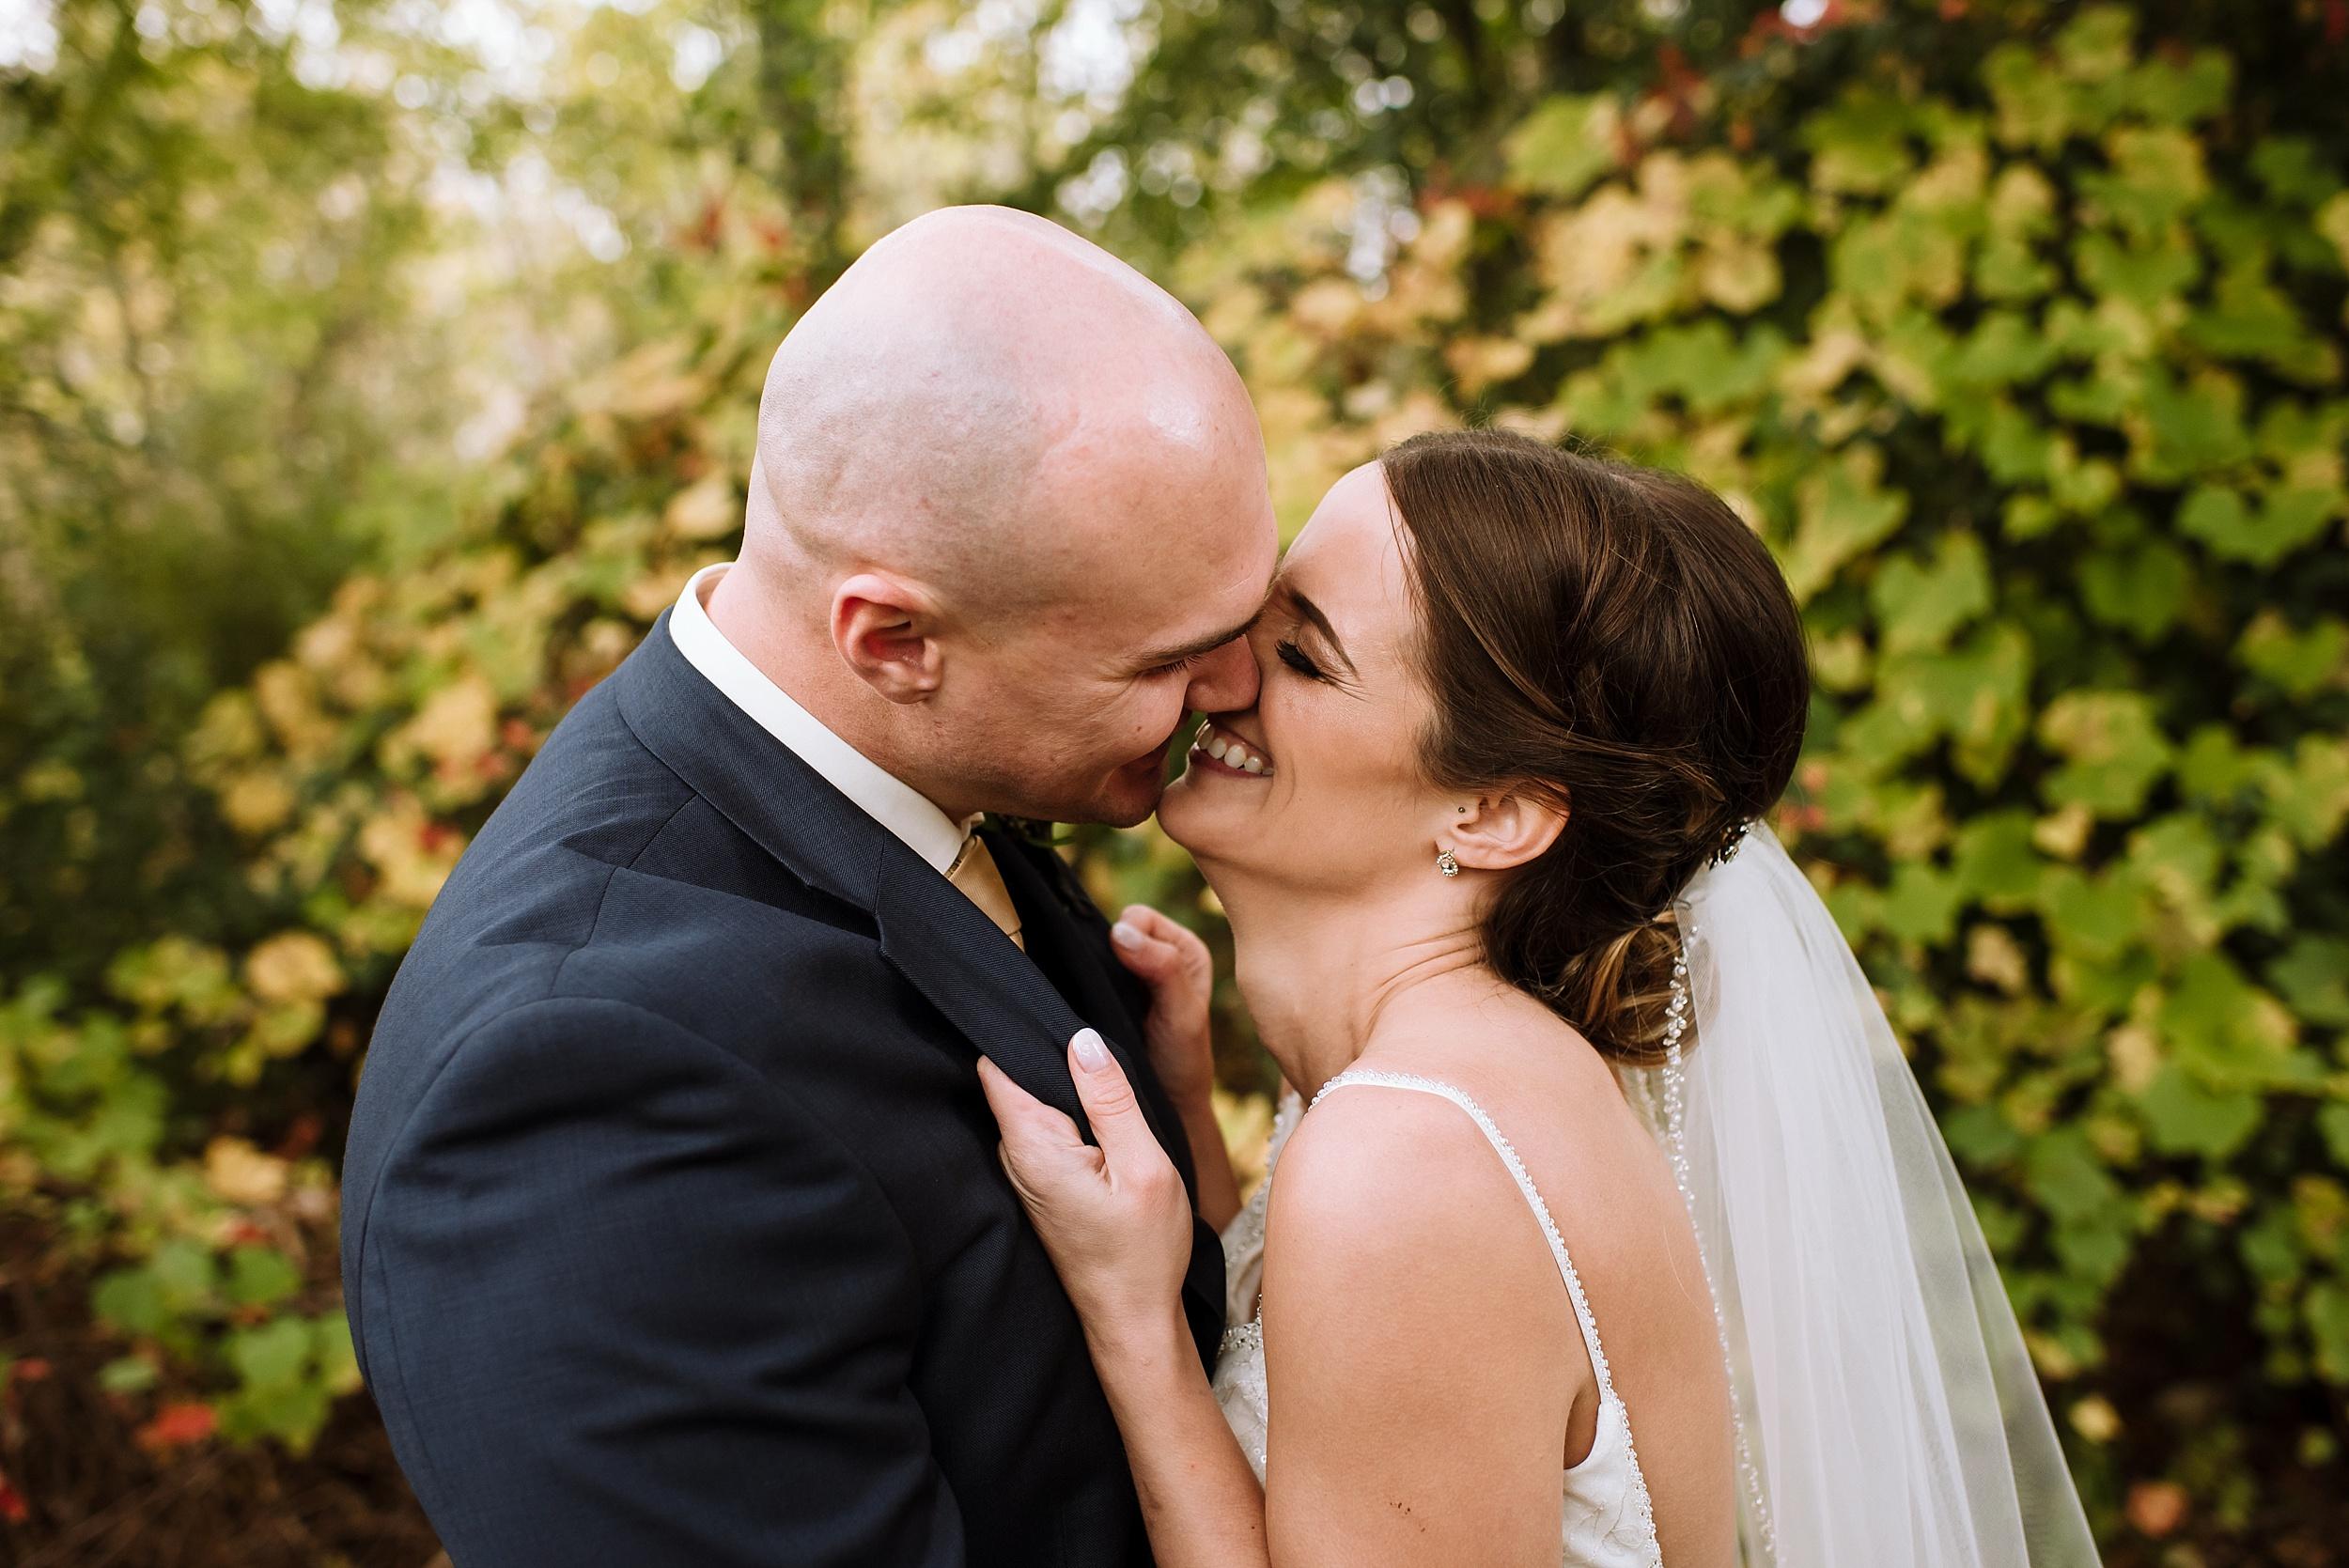 Windemere_Manor_Fall_Wedding_London_Toronto_Wedding_Photographer_0020.jpg